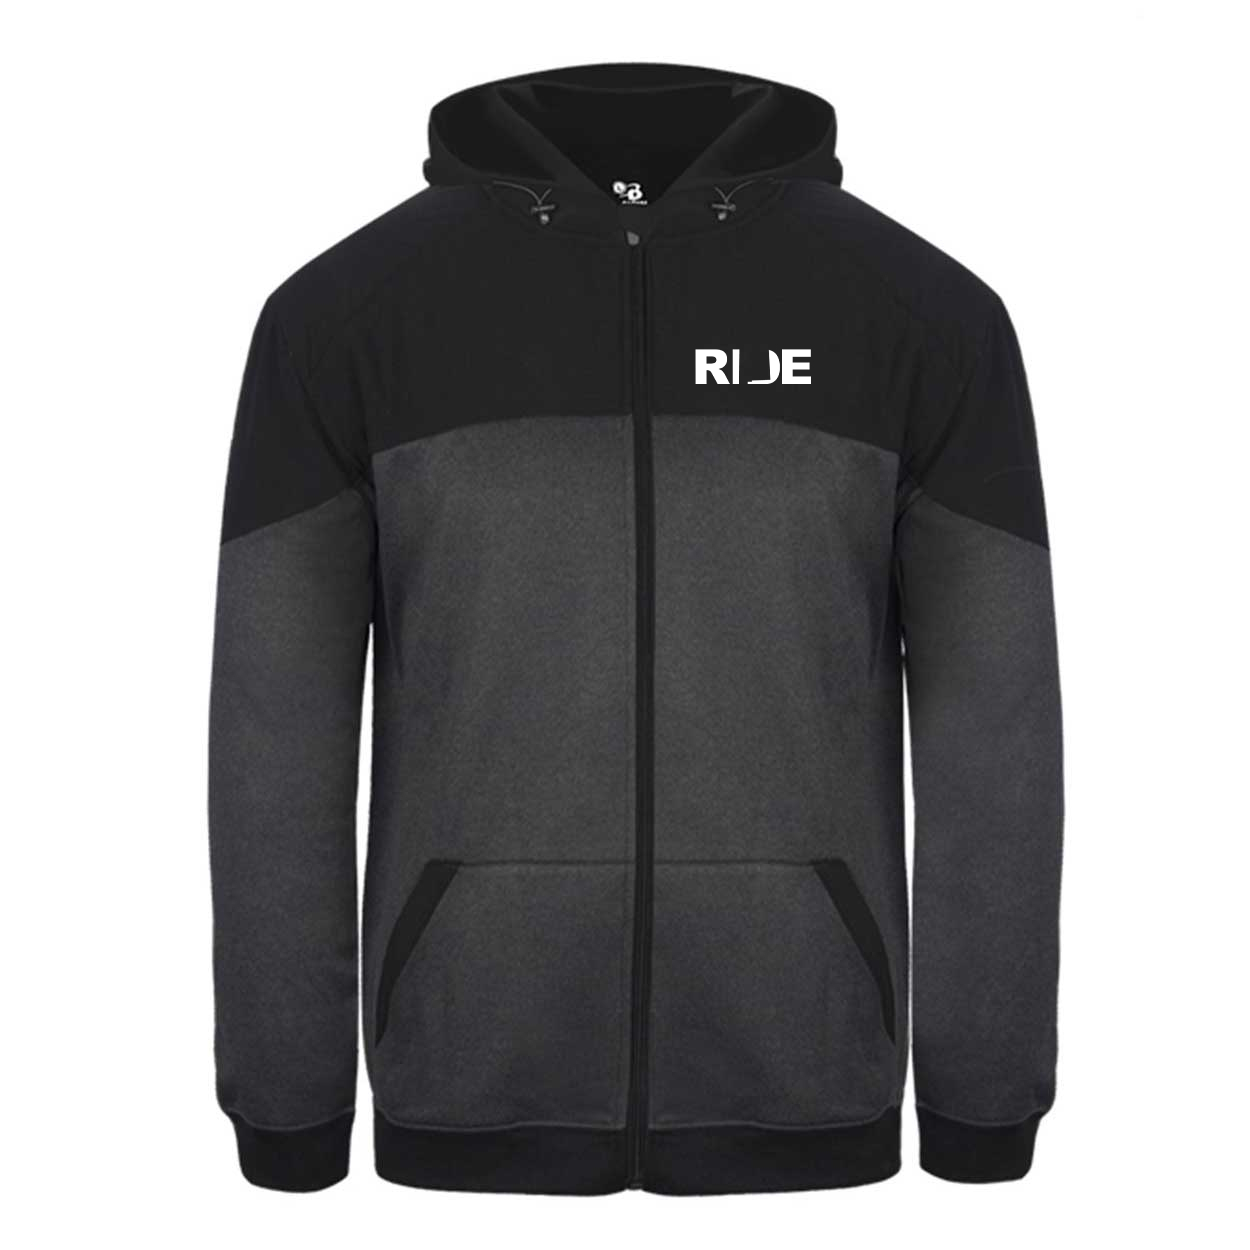 Ride New Mexico Classic Vindicator Jacket Carbon Heather/Black (White Logo)